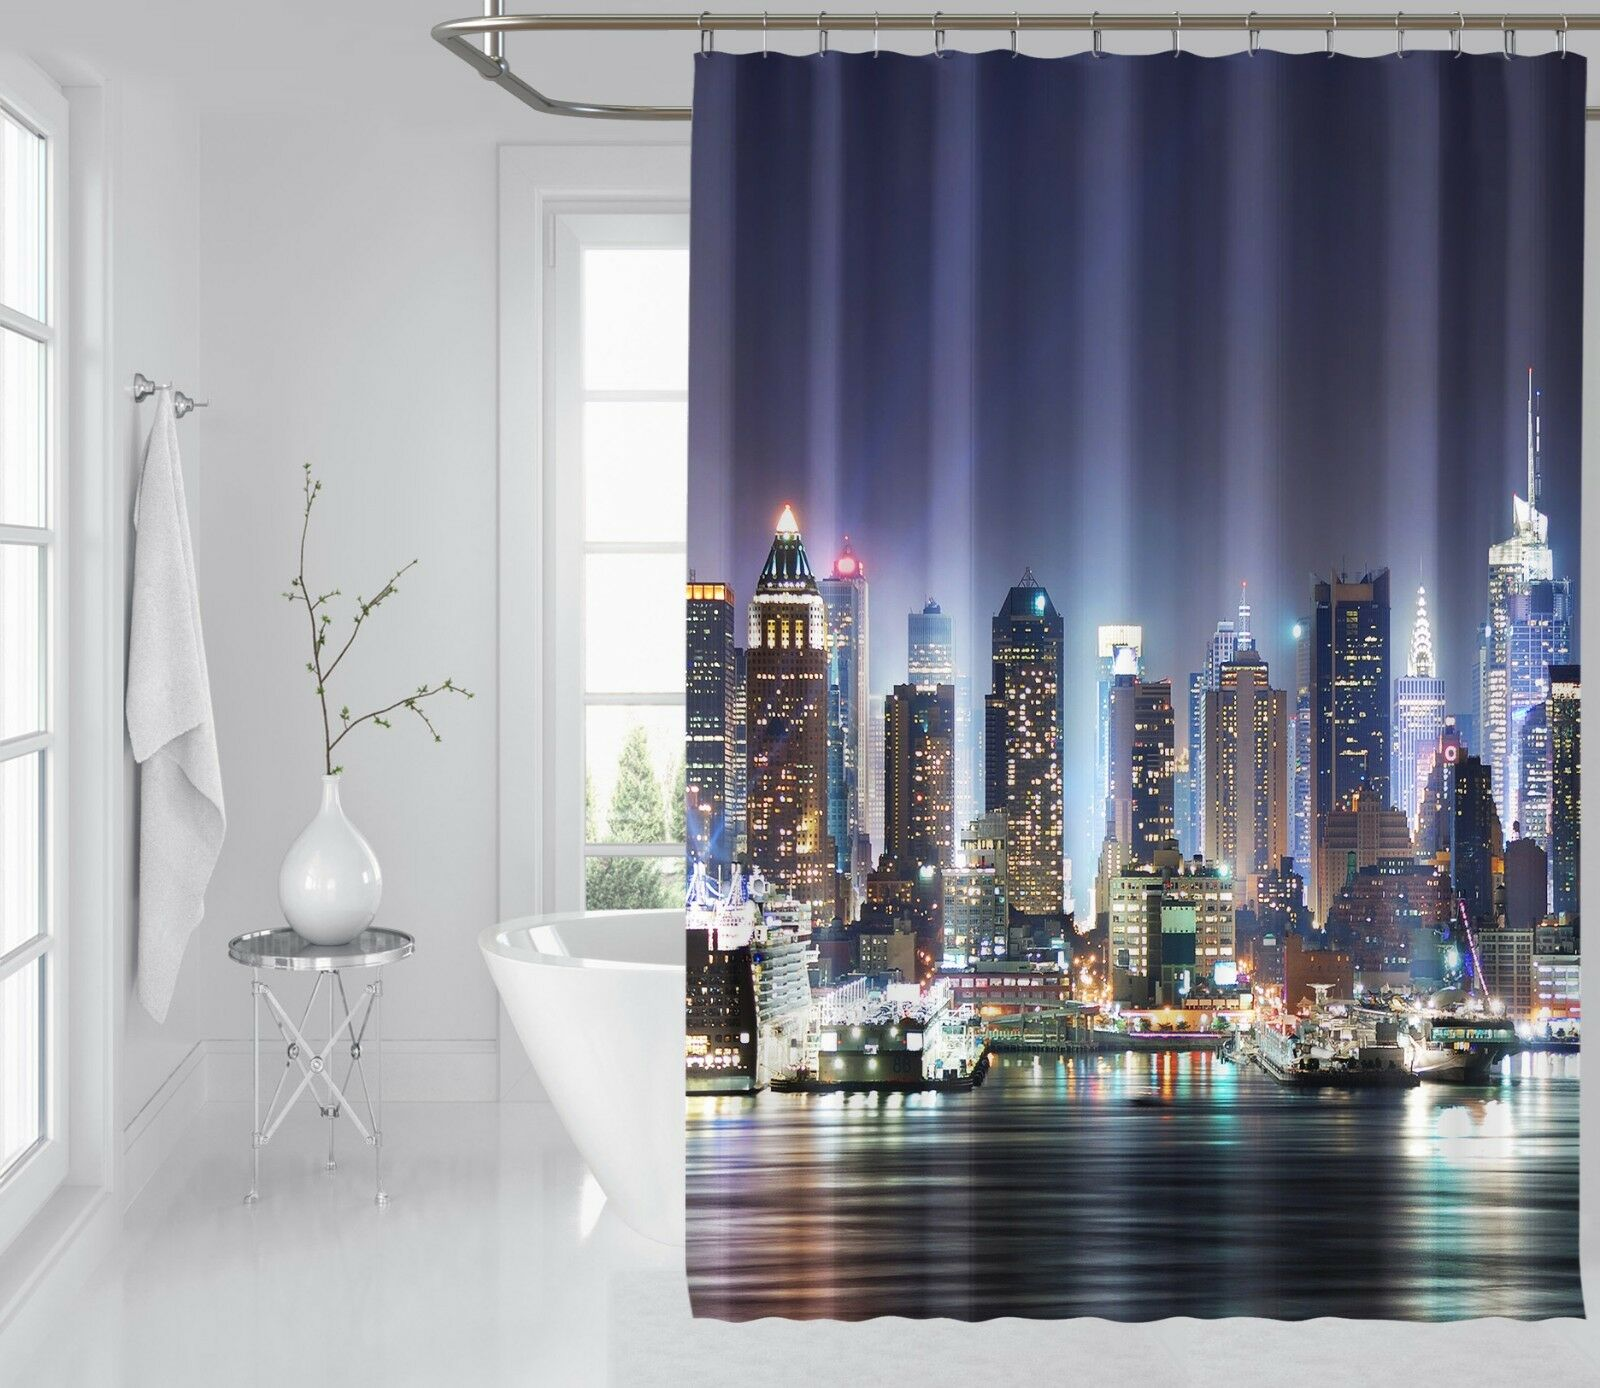 3D CITY NIGHT VIEW 8 Tenda da doccia IMPERMEABILE Fibra Bagno WC Windows